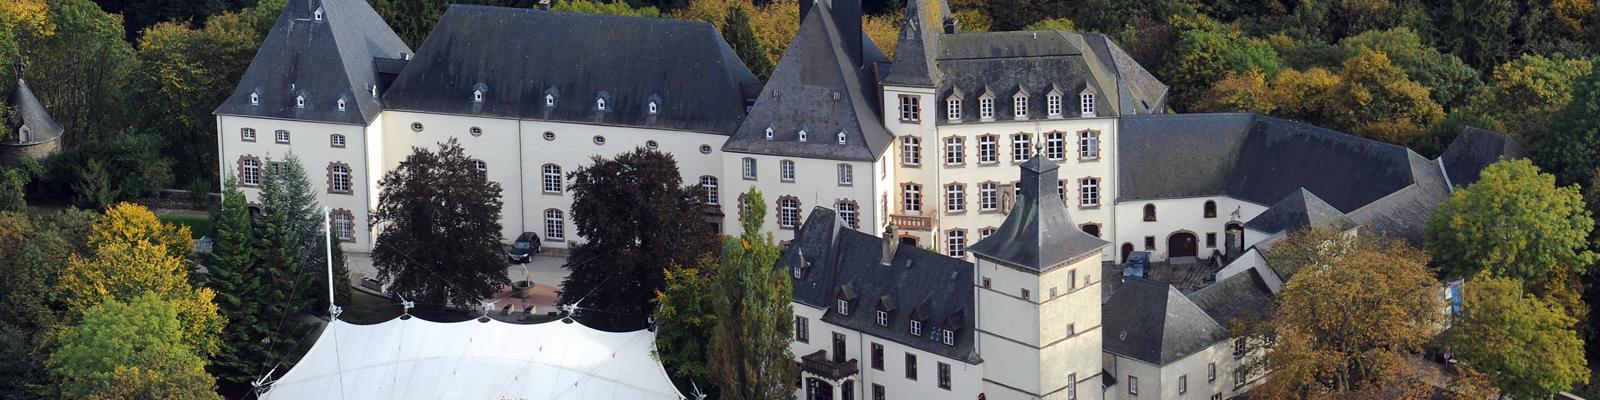 124413_124291_csm_slide_chateau_f8b09521011.jpg